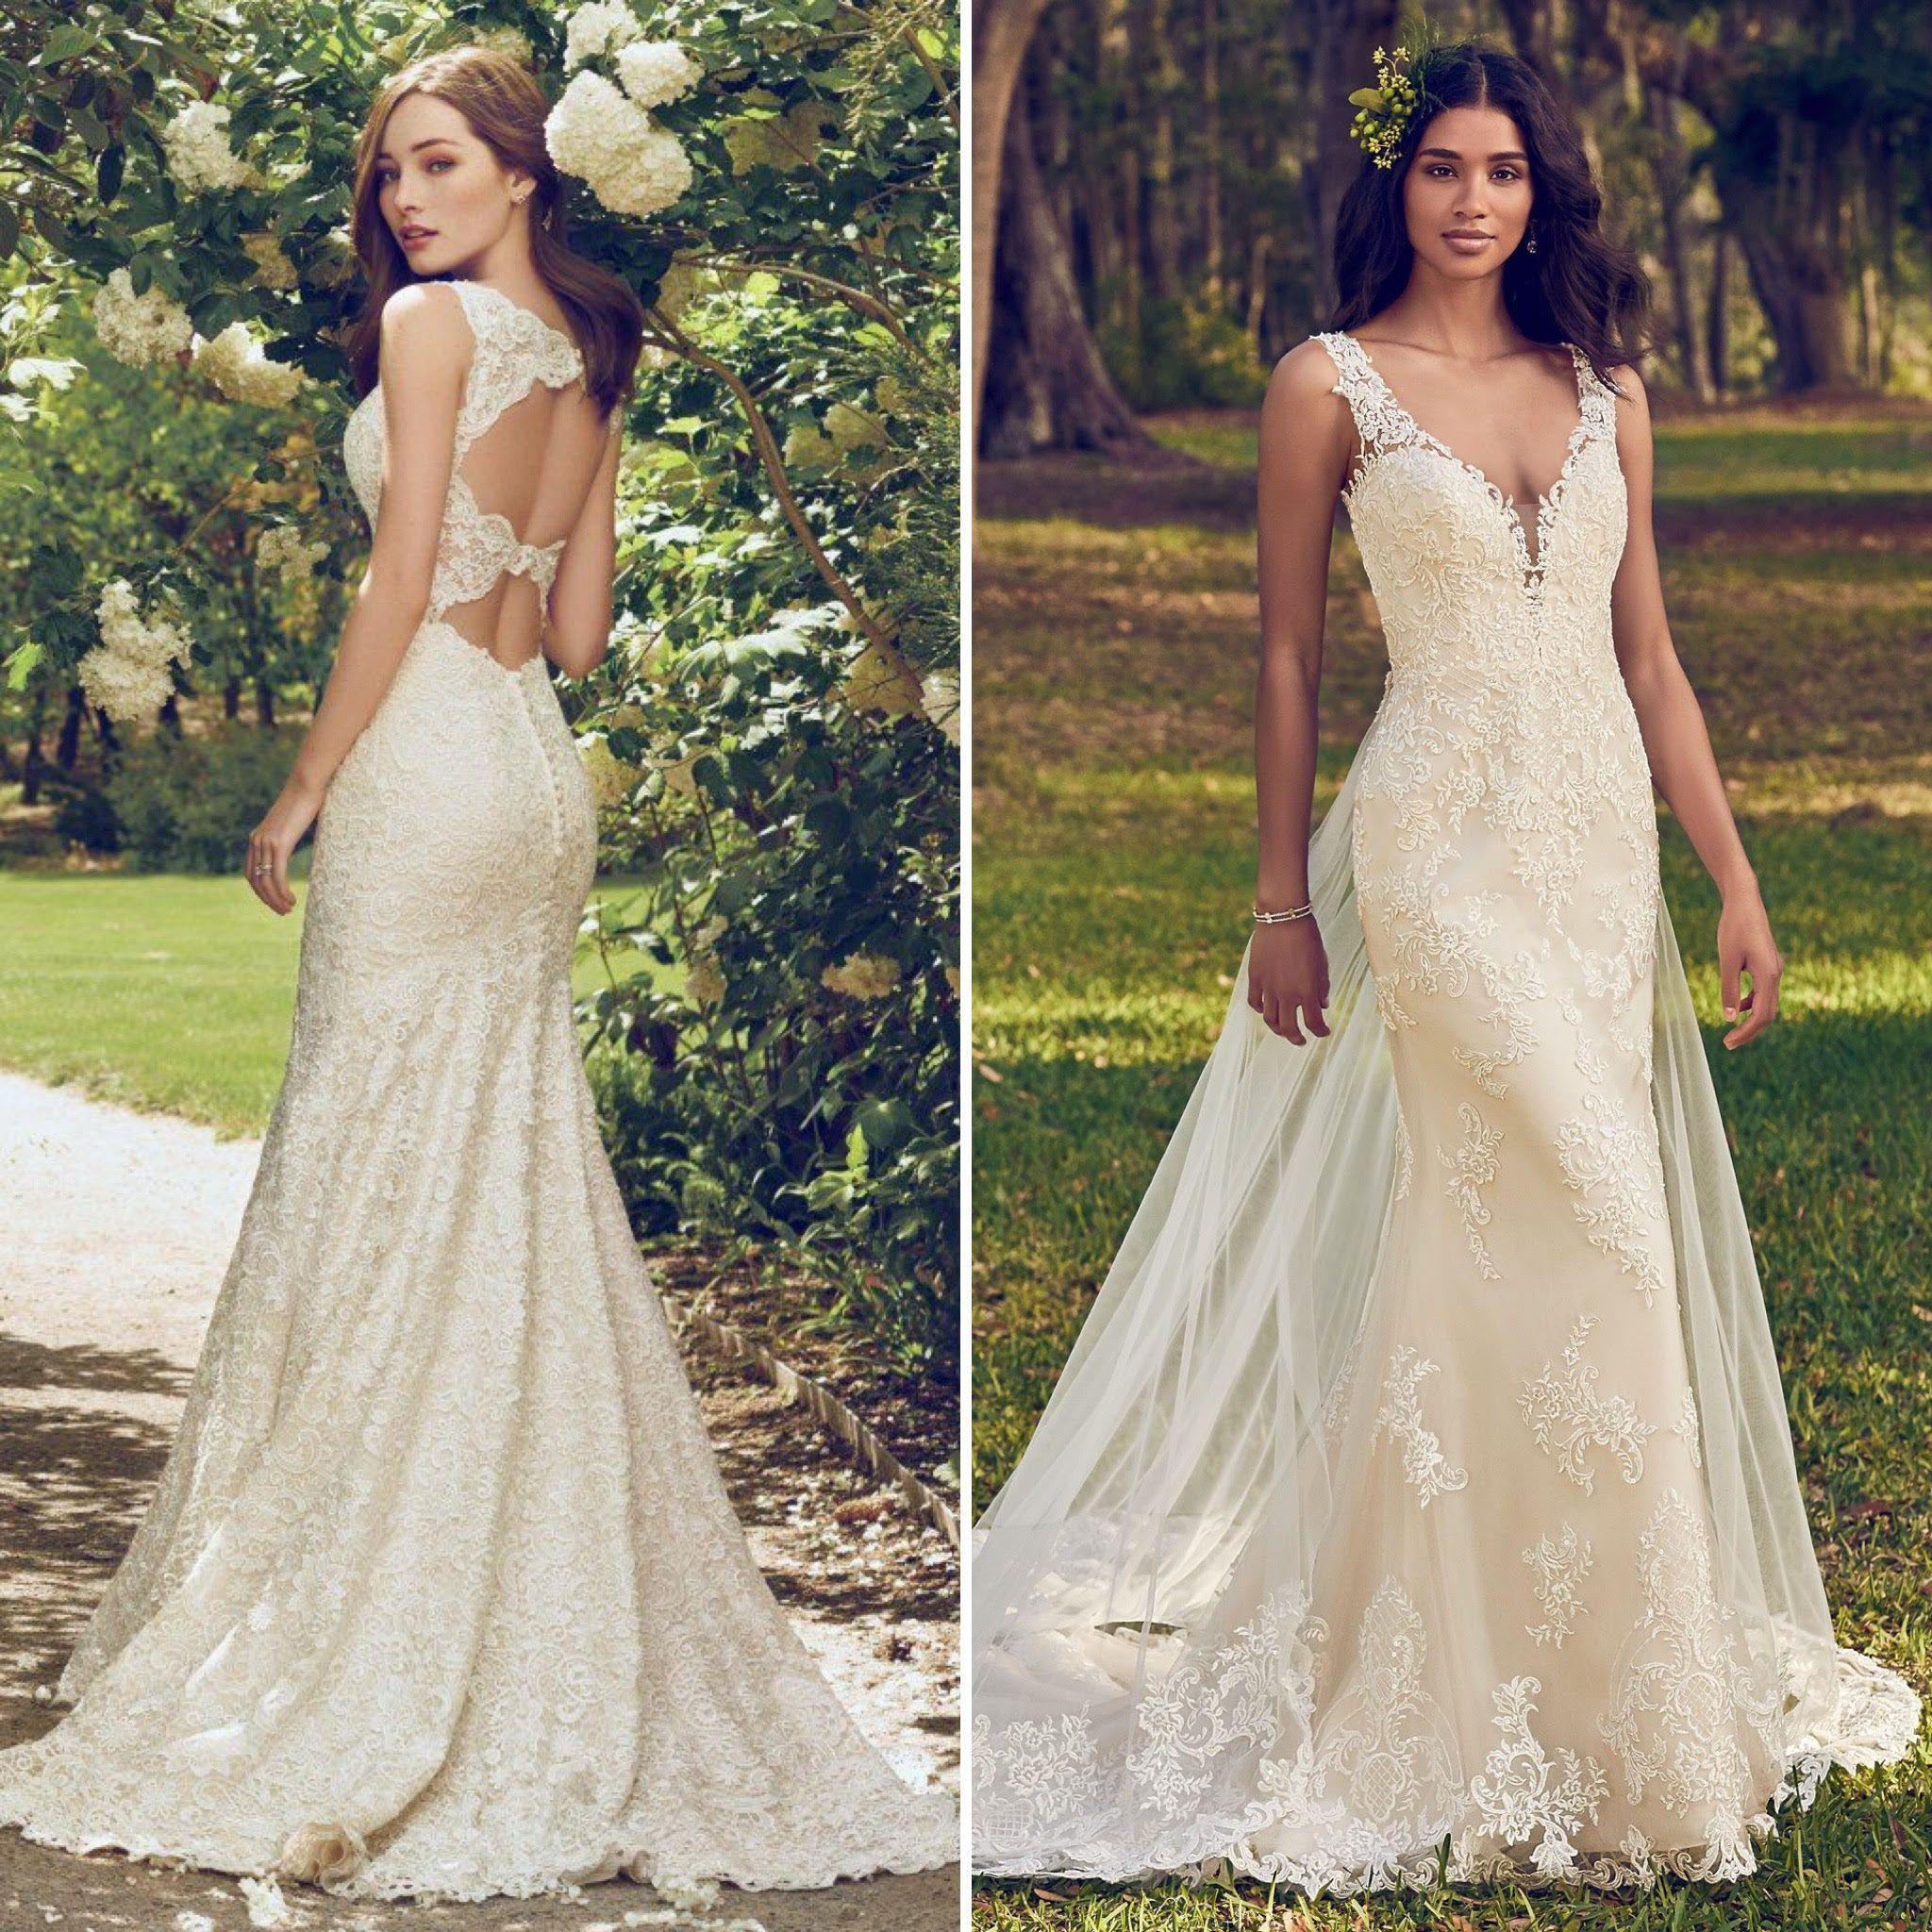 Light Gold Vs Champagne Wedding Dress Popular Wedding Dresses Champagne Color Dress Wedding Dresses